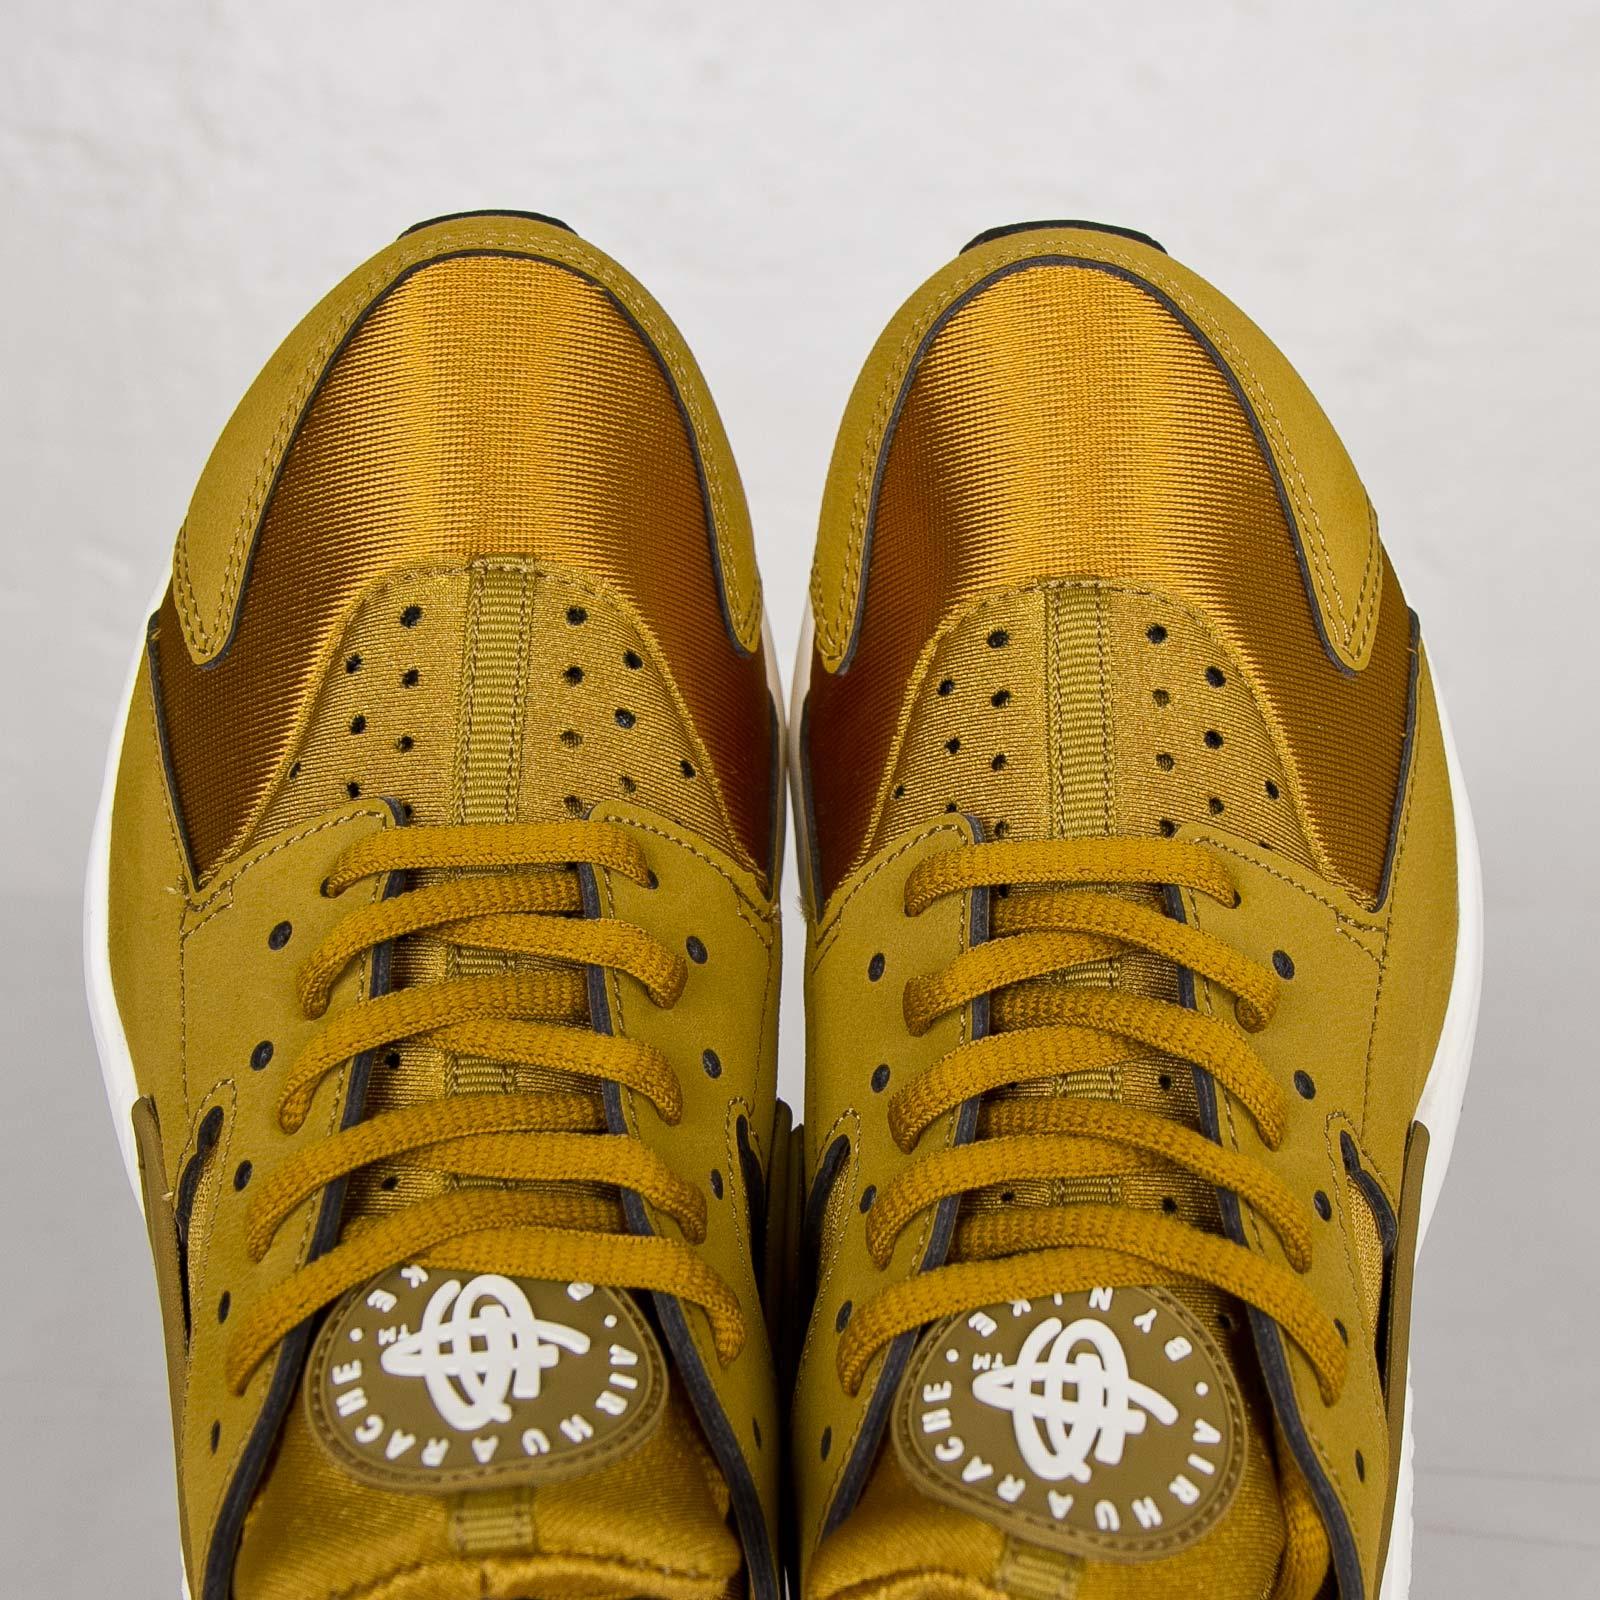 los angeles 1acfe 92d64 Nike Wmns Air Huarache Run - 634835-700 - Sneakersnstuff   sneakers    streetwear online since 1999